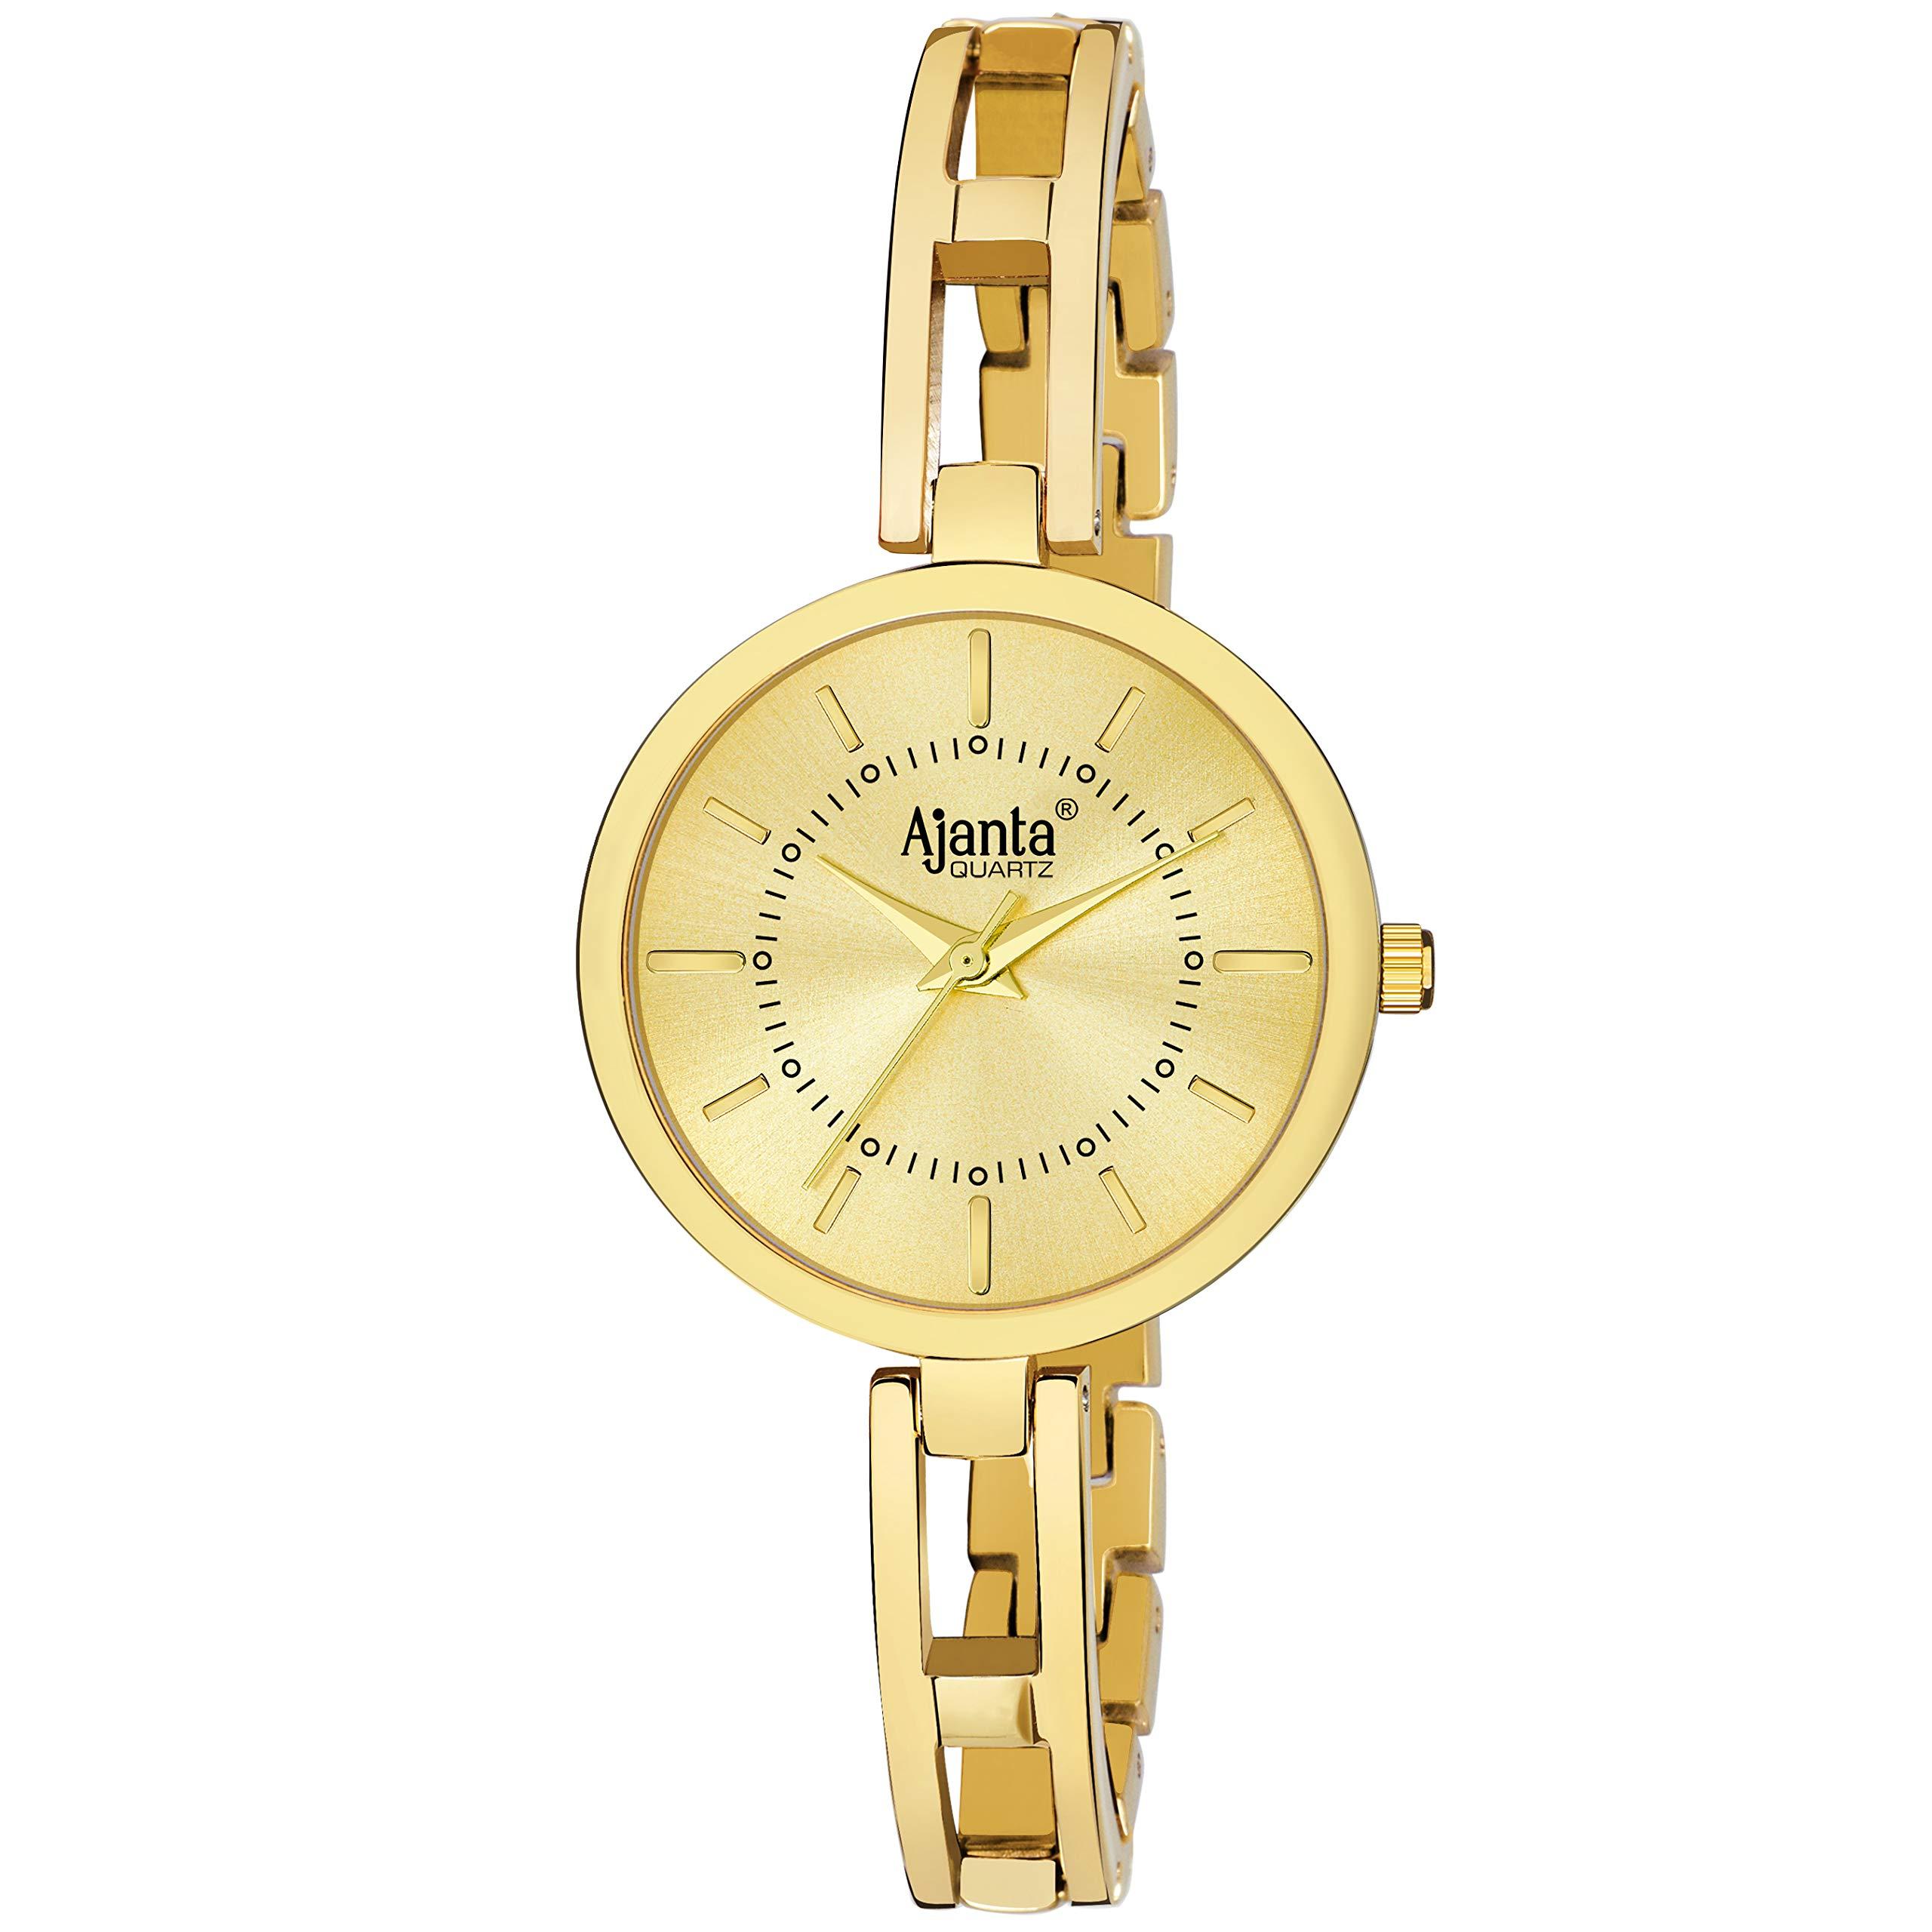 Ajanta Quartz Analogue Golden Dial Women's Watch (Golden) - AWC208-2-GLG-GL (B07WC26STS) Amazon Price History, Amazon Price Tracker